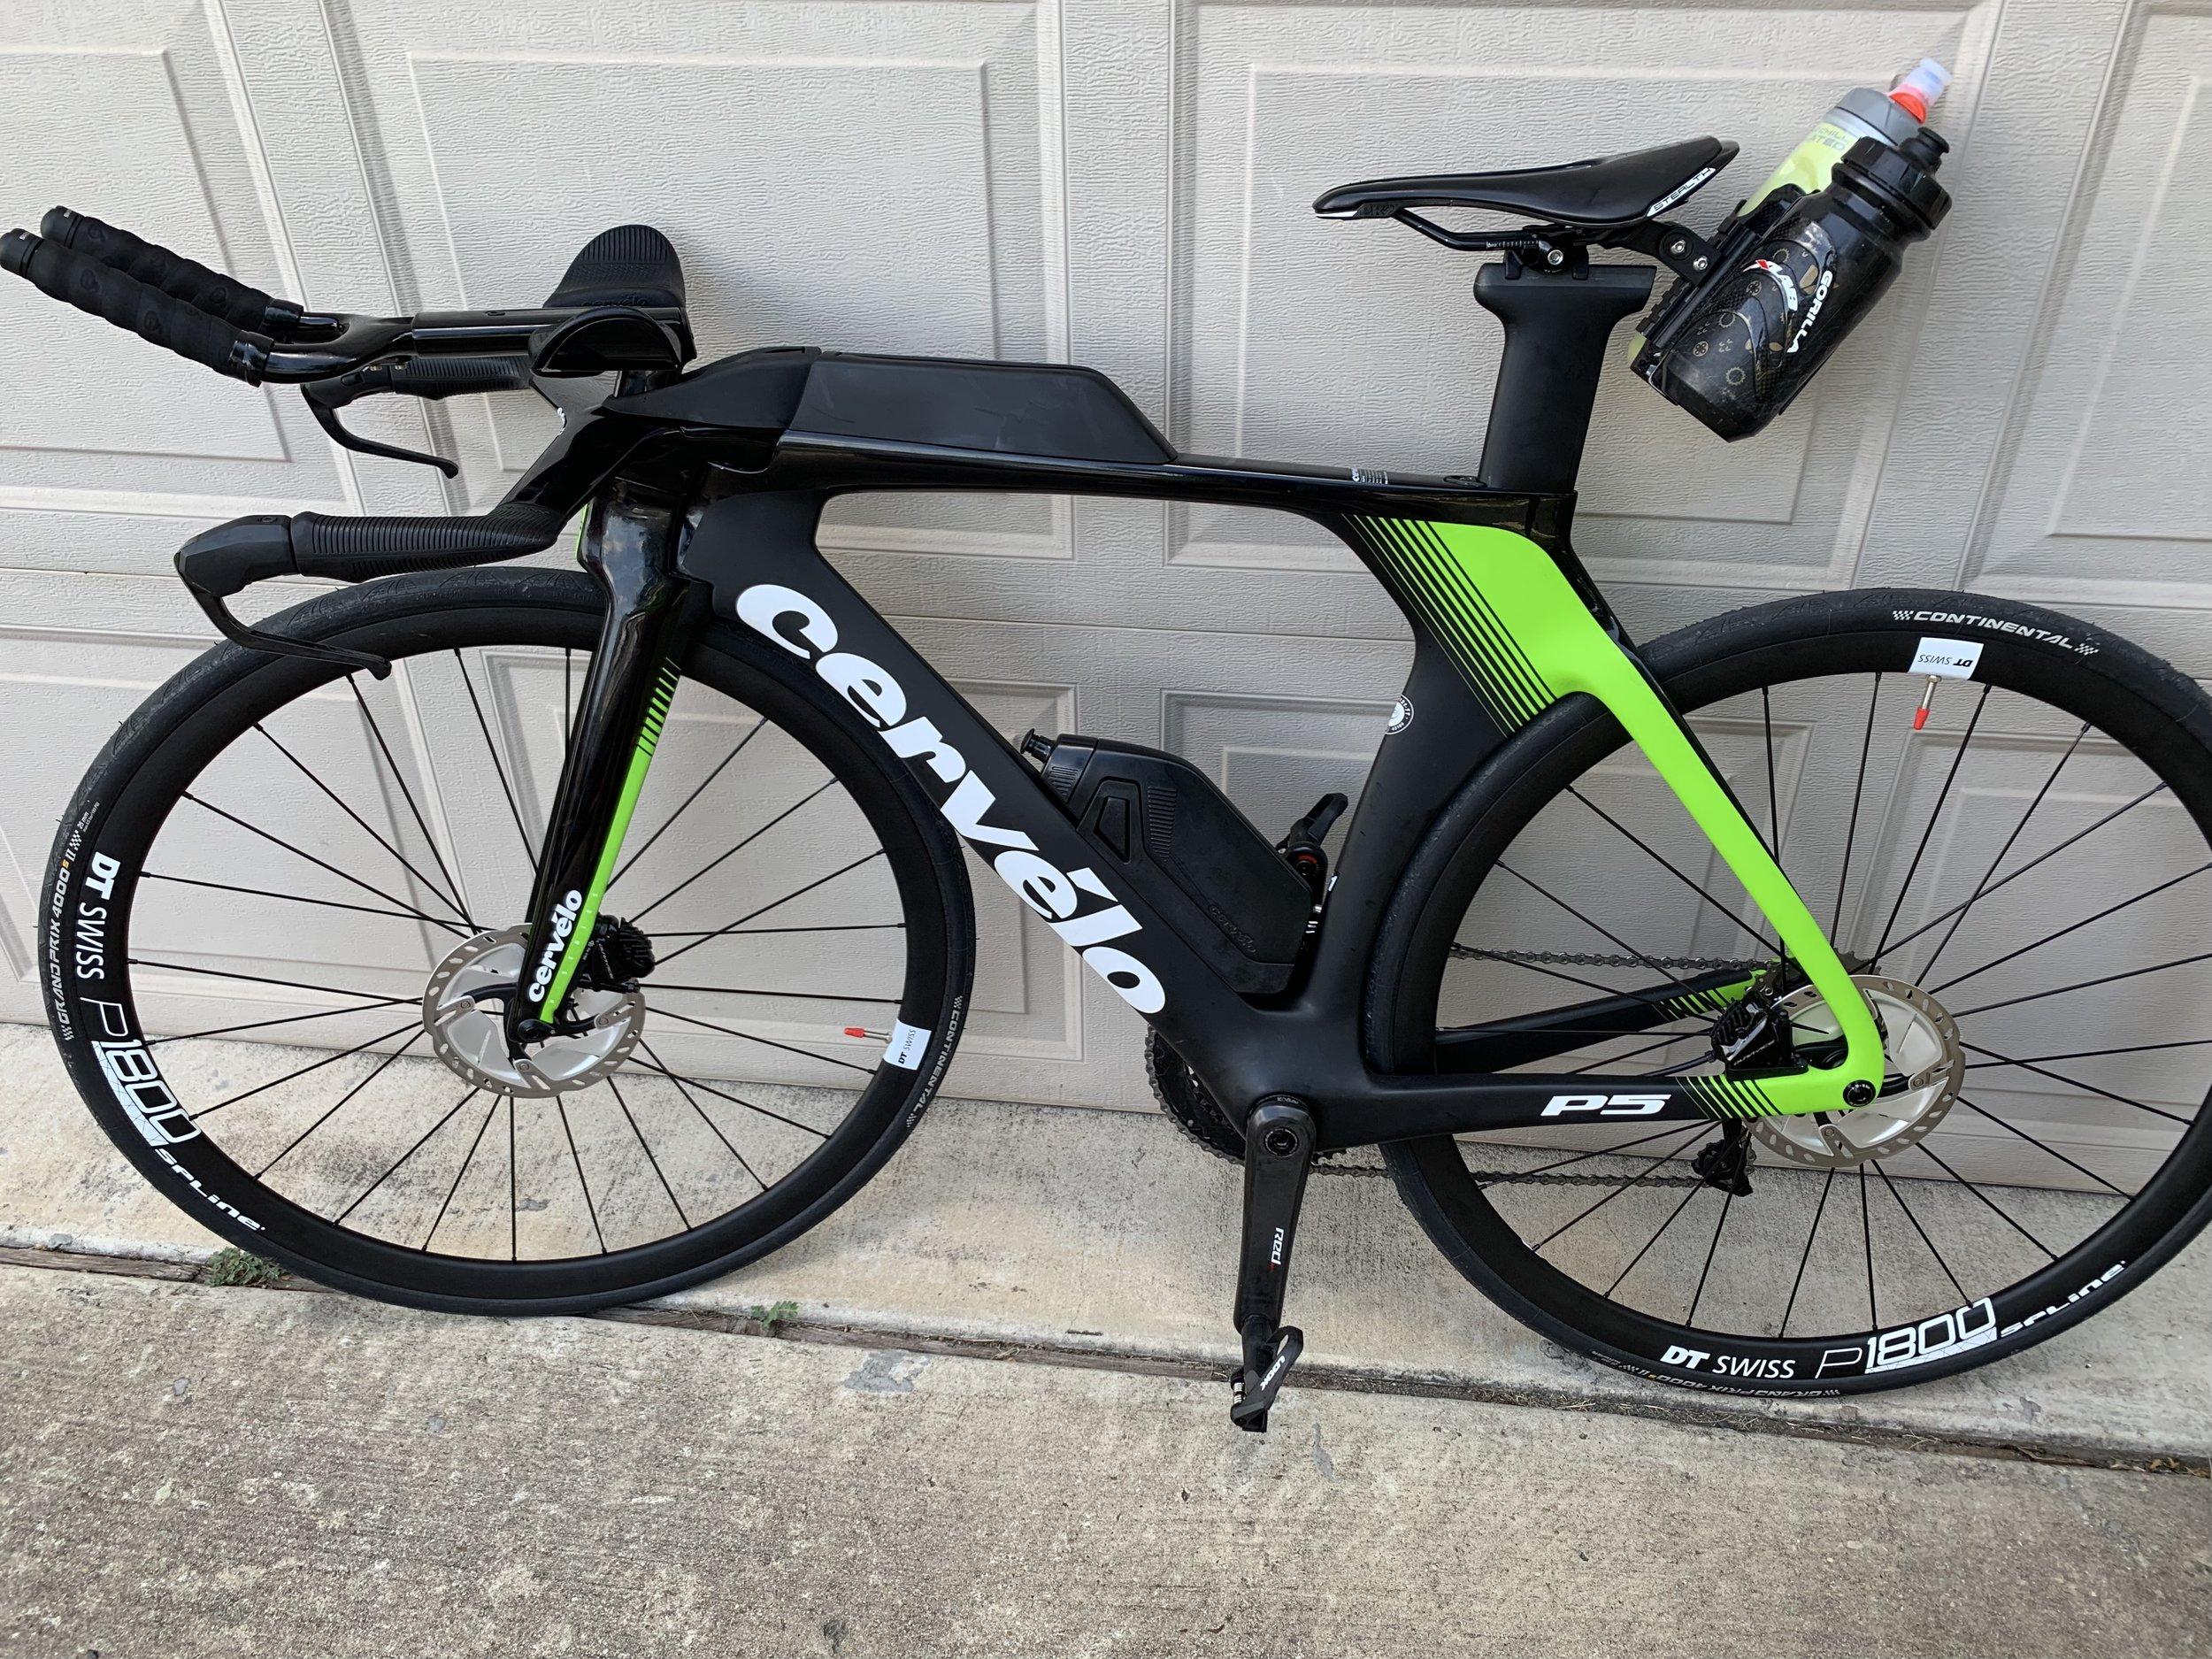 New bike = $$$